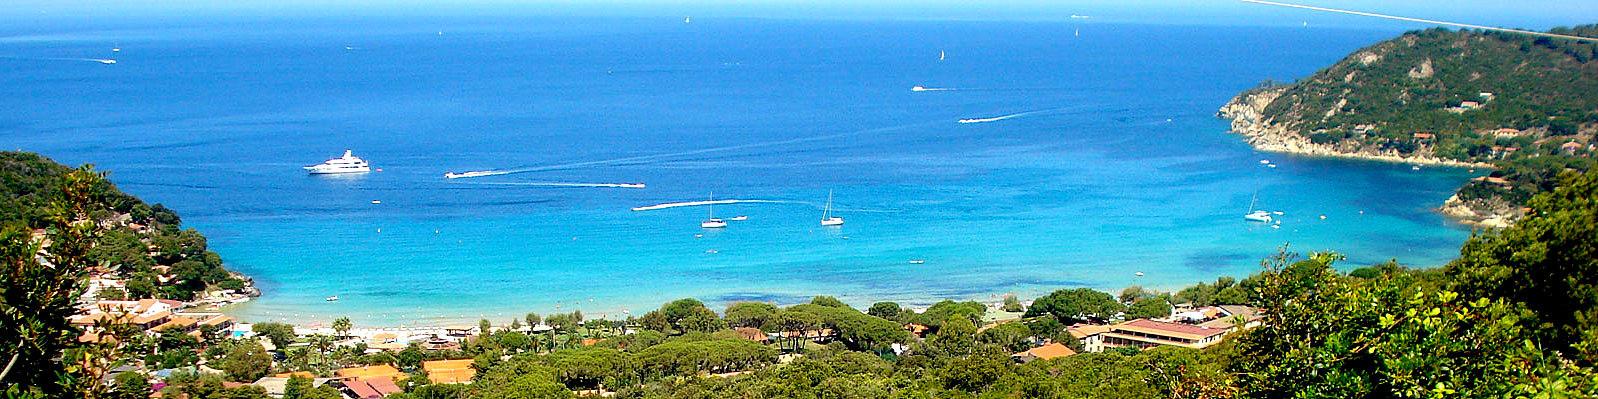 Záliv Biodola, v centru pláž La Biodola, vpravo pláž Scaglieri, za ní pláž Forno